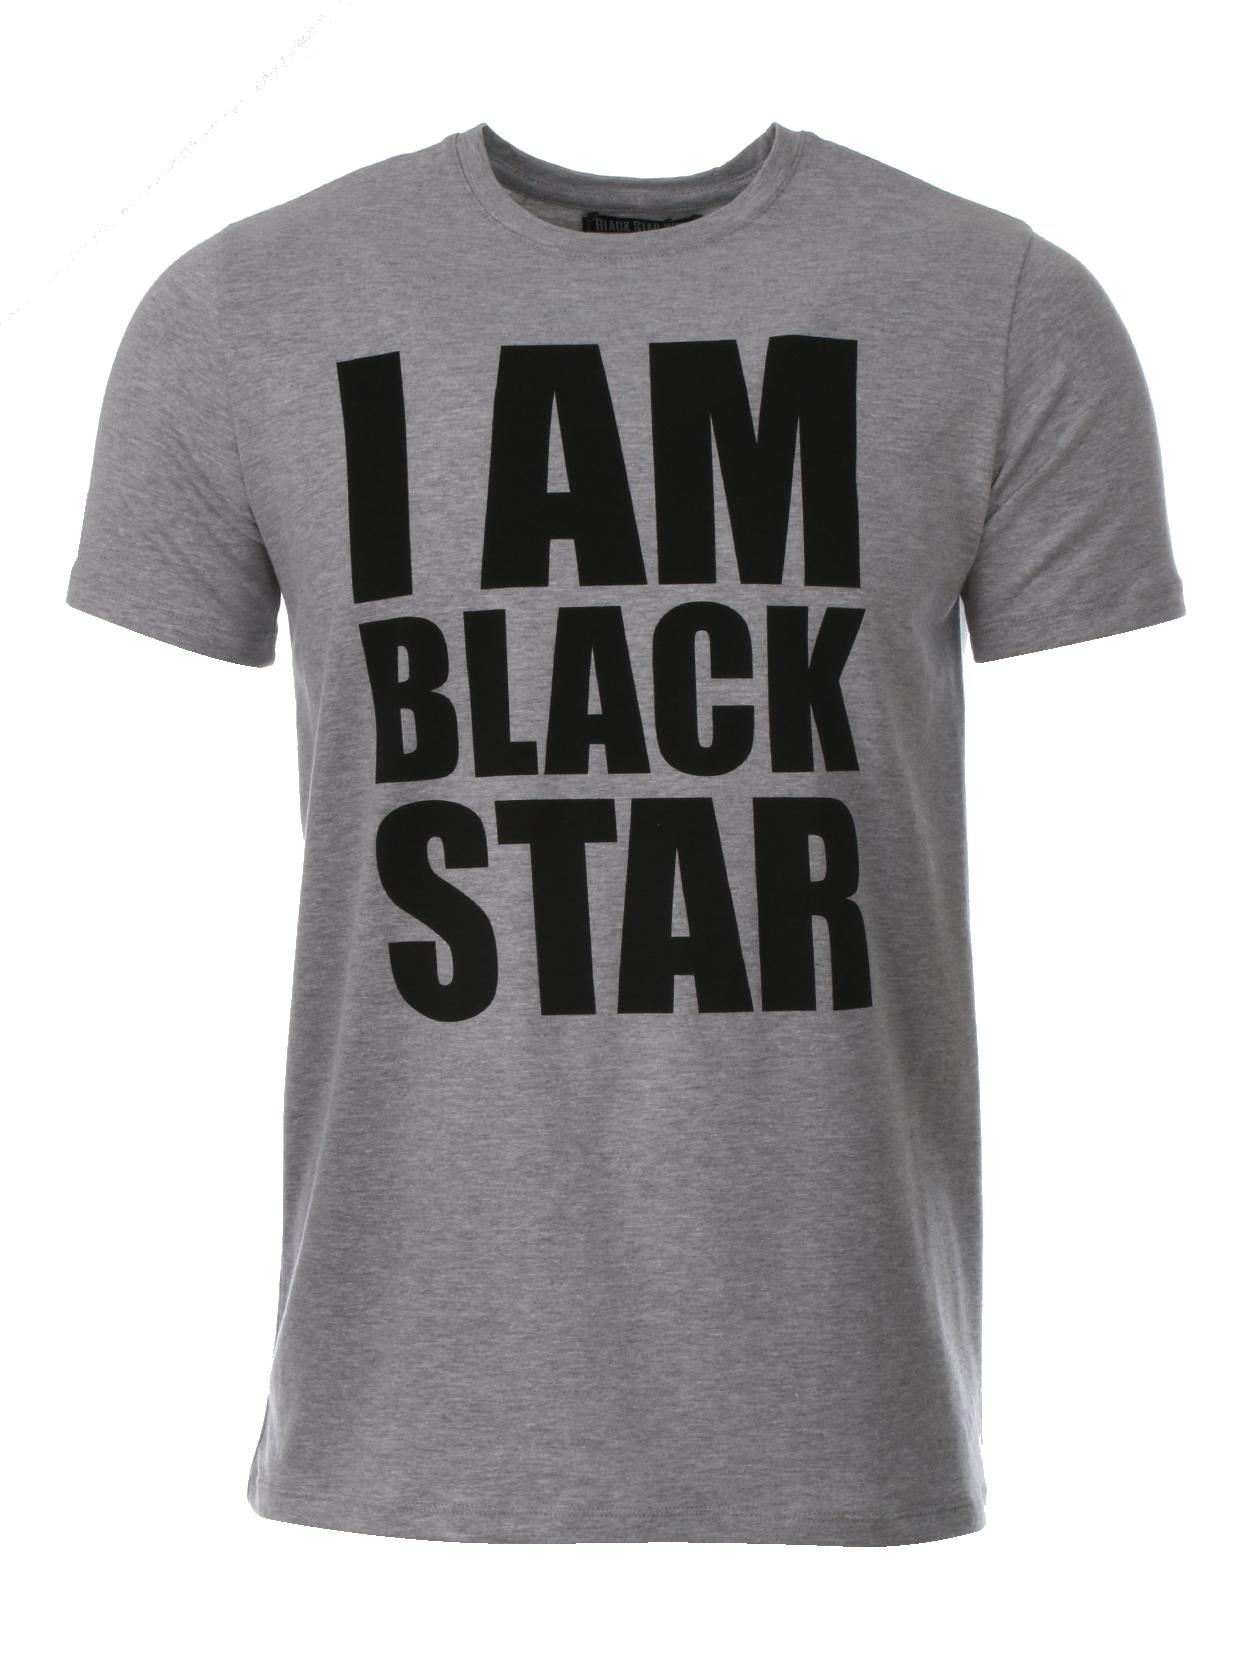 Teens t-shirt I AM BLACK STAR